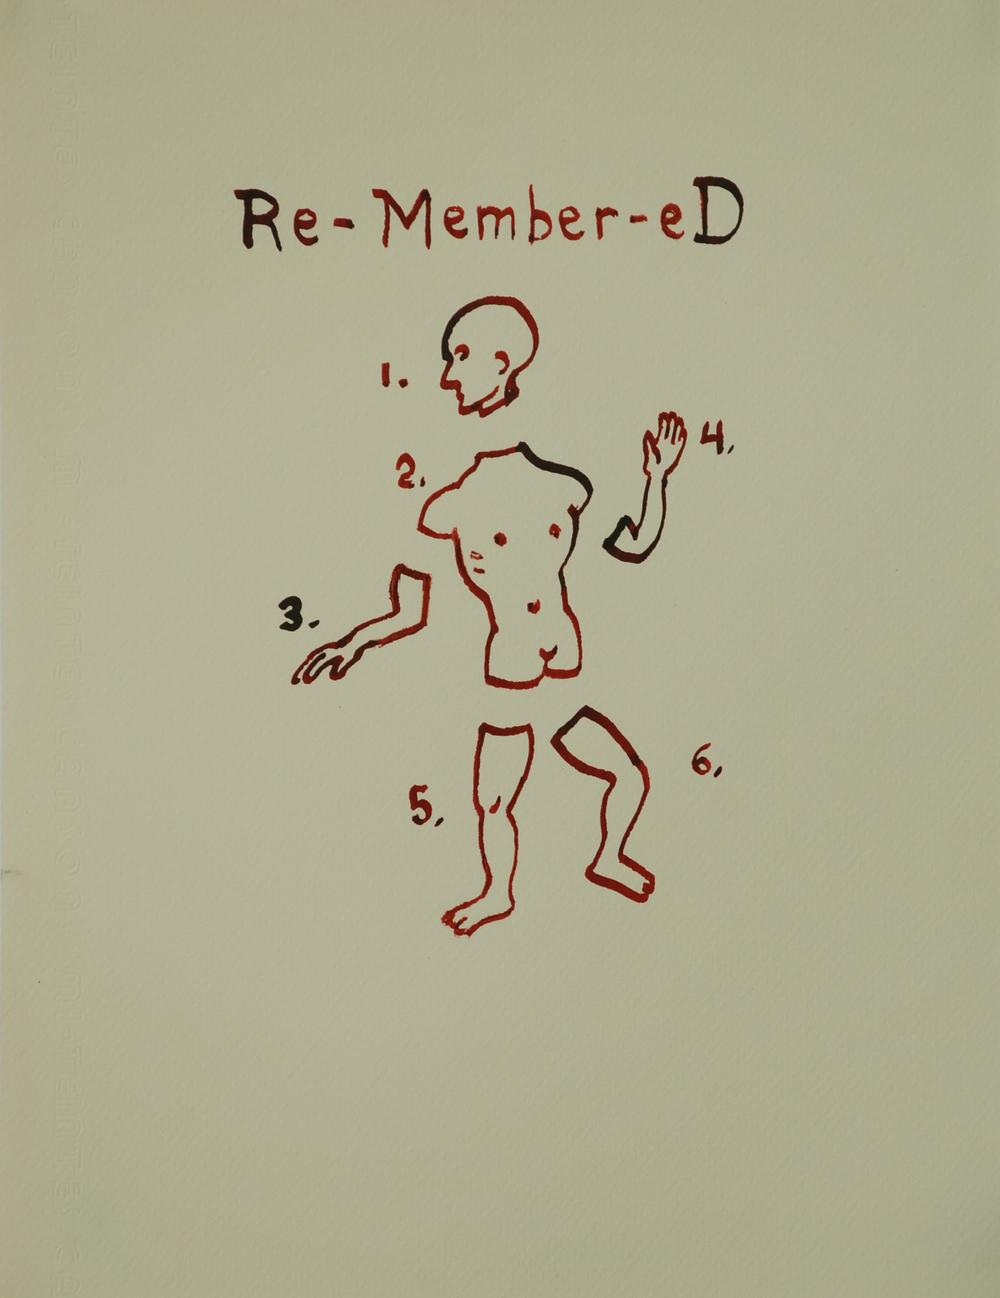 0311 Re-Member-Ed.JPG